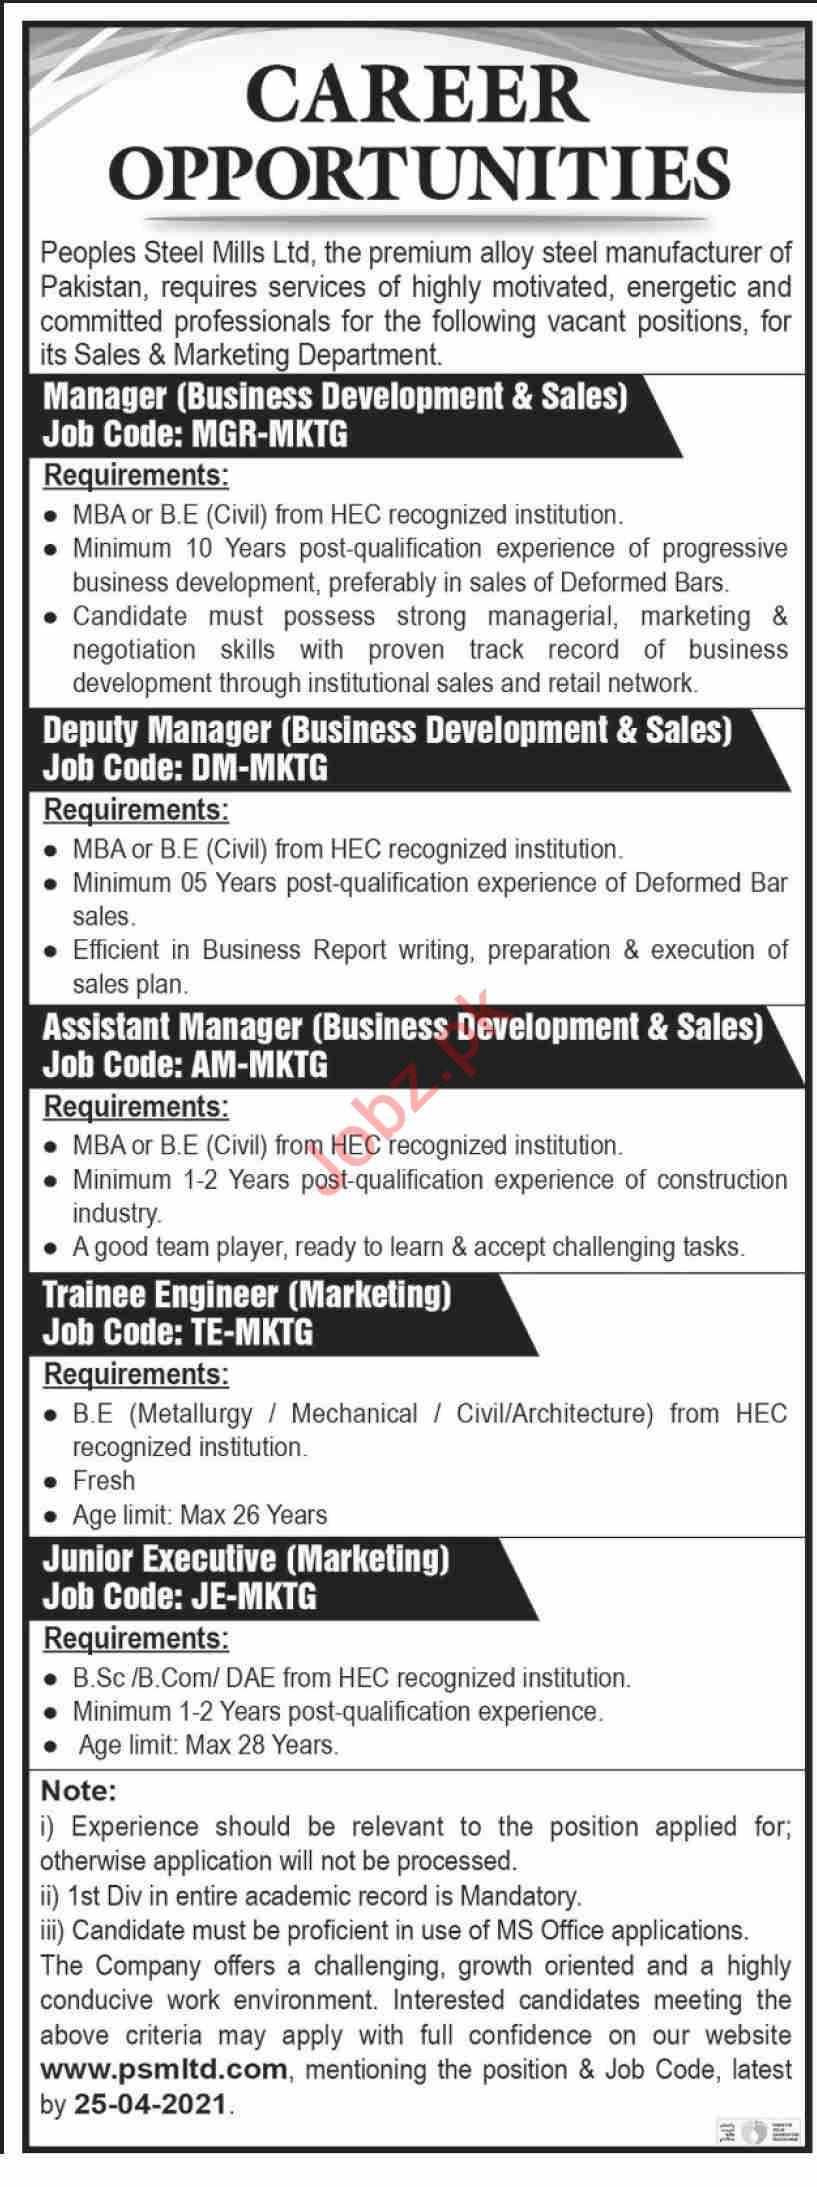 Peoples Steel Mills Karachi Jobs 2021 for Manager